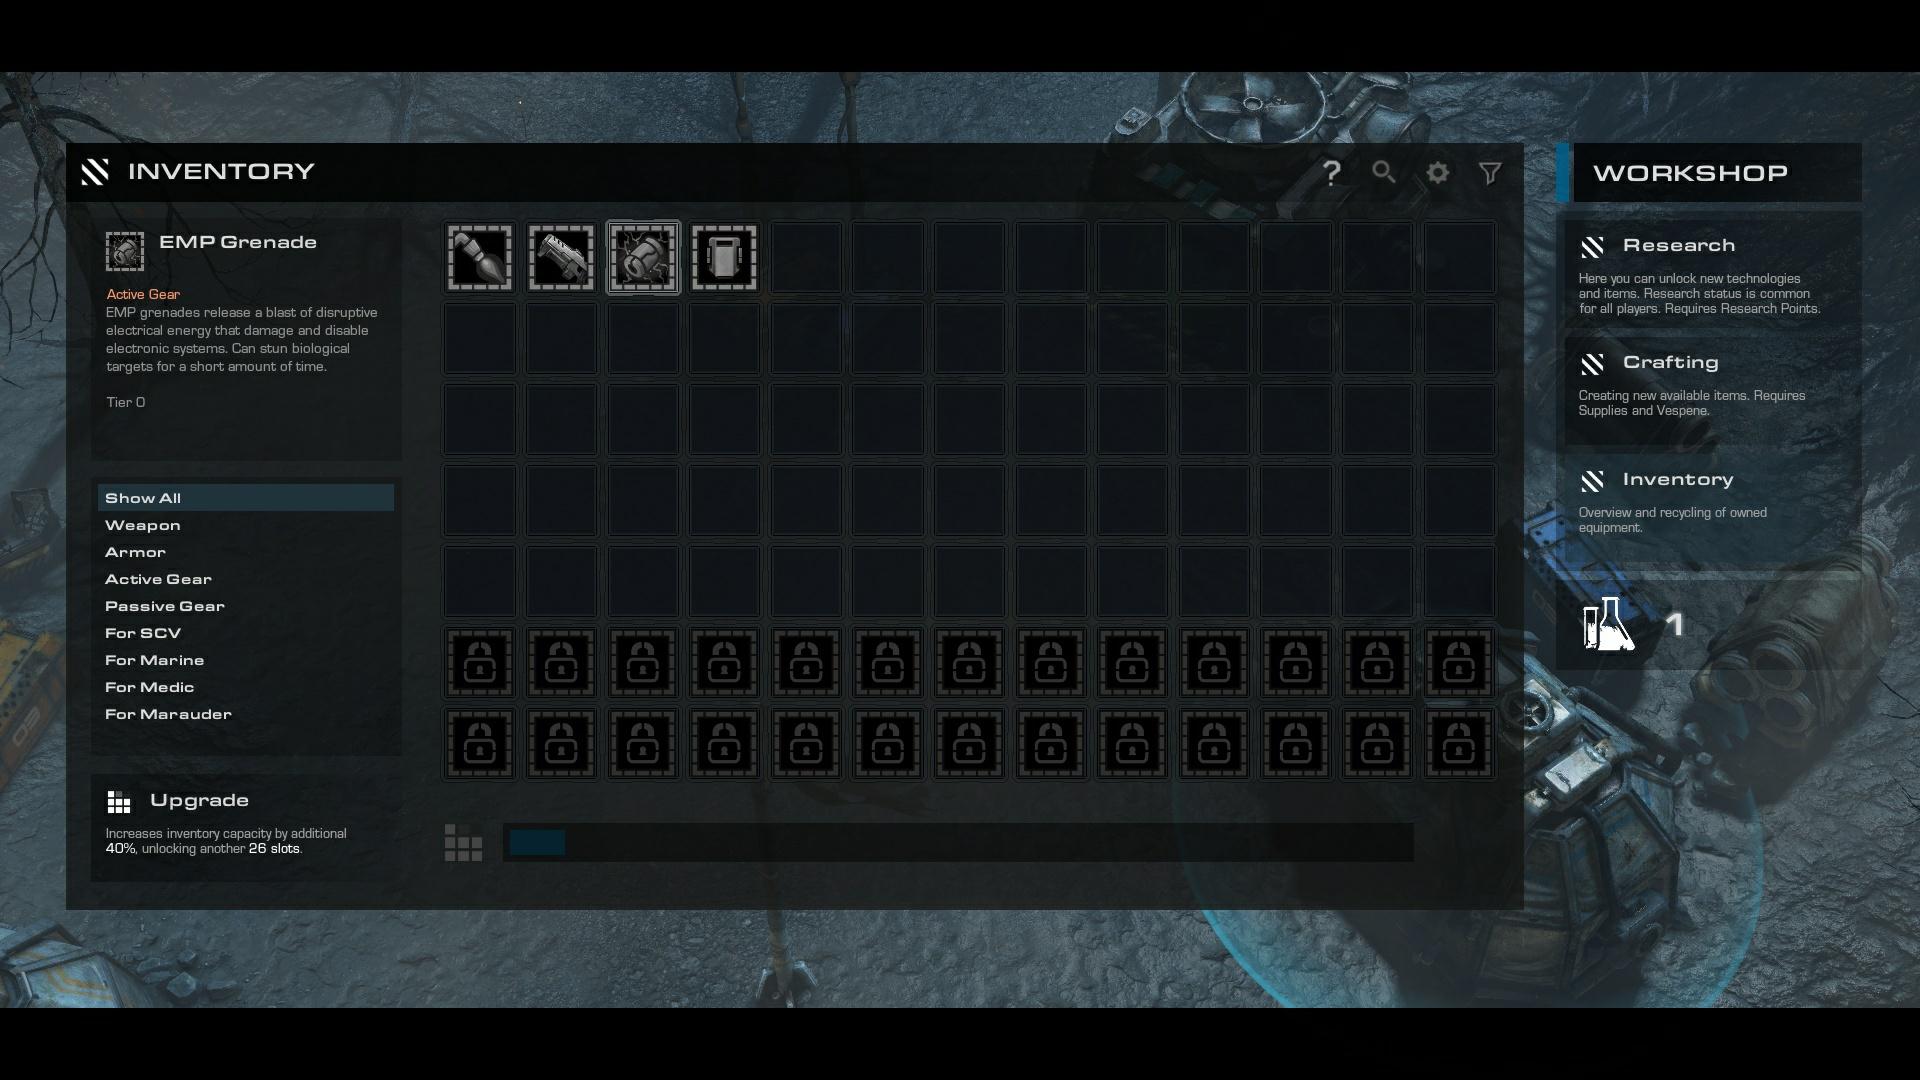 imprv inventory